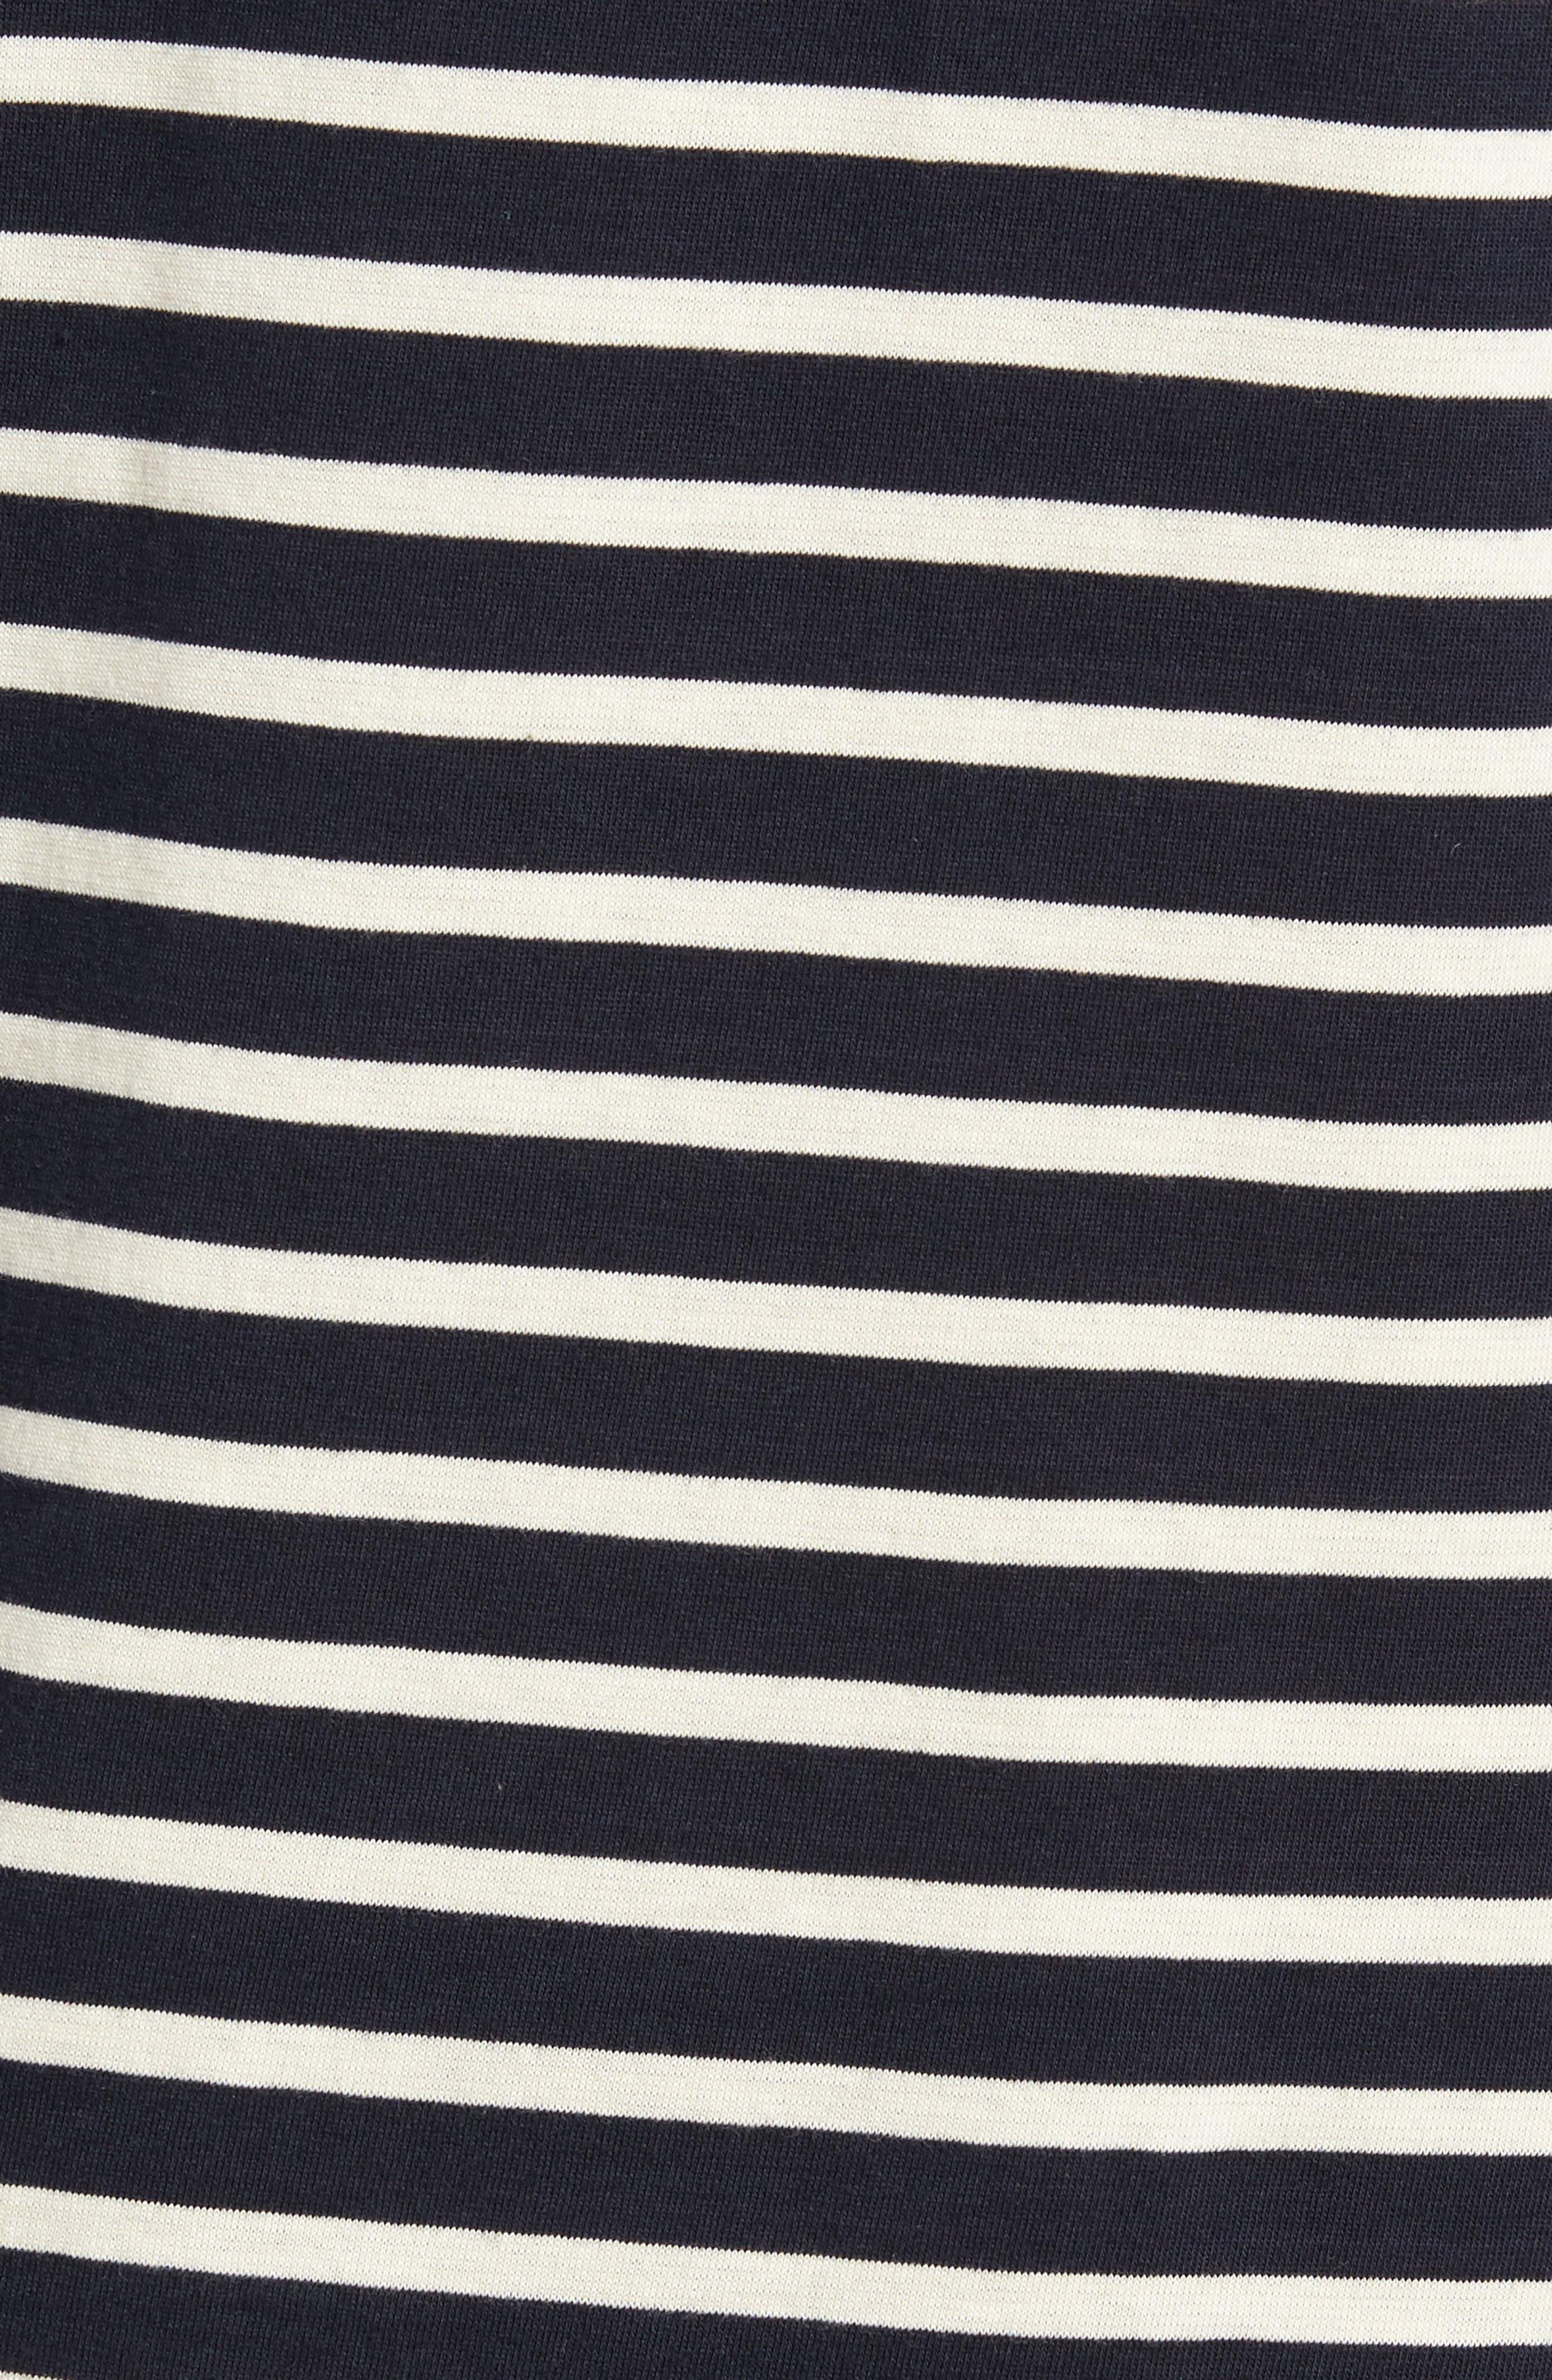 Mix Stripe Long Sleeve T-Shirt,                             Alternate thumbnail 5, color,                             Turtle Dove/ Marine Blue